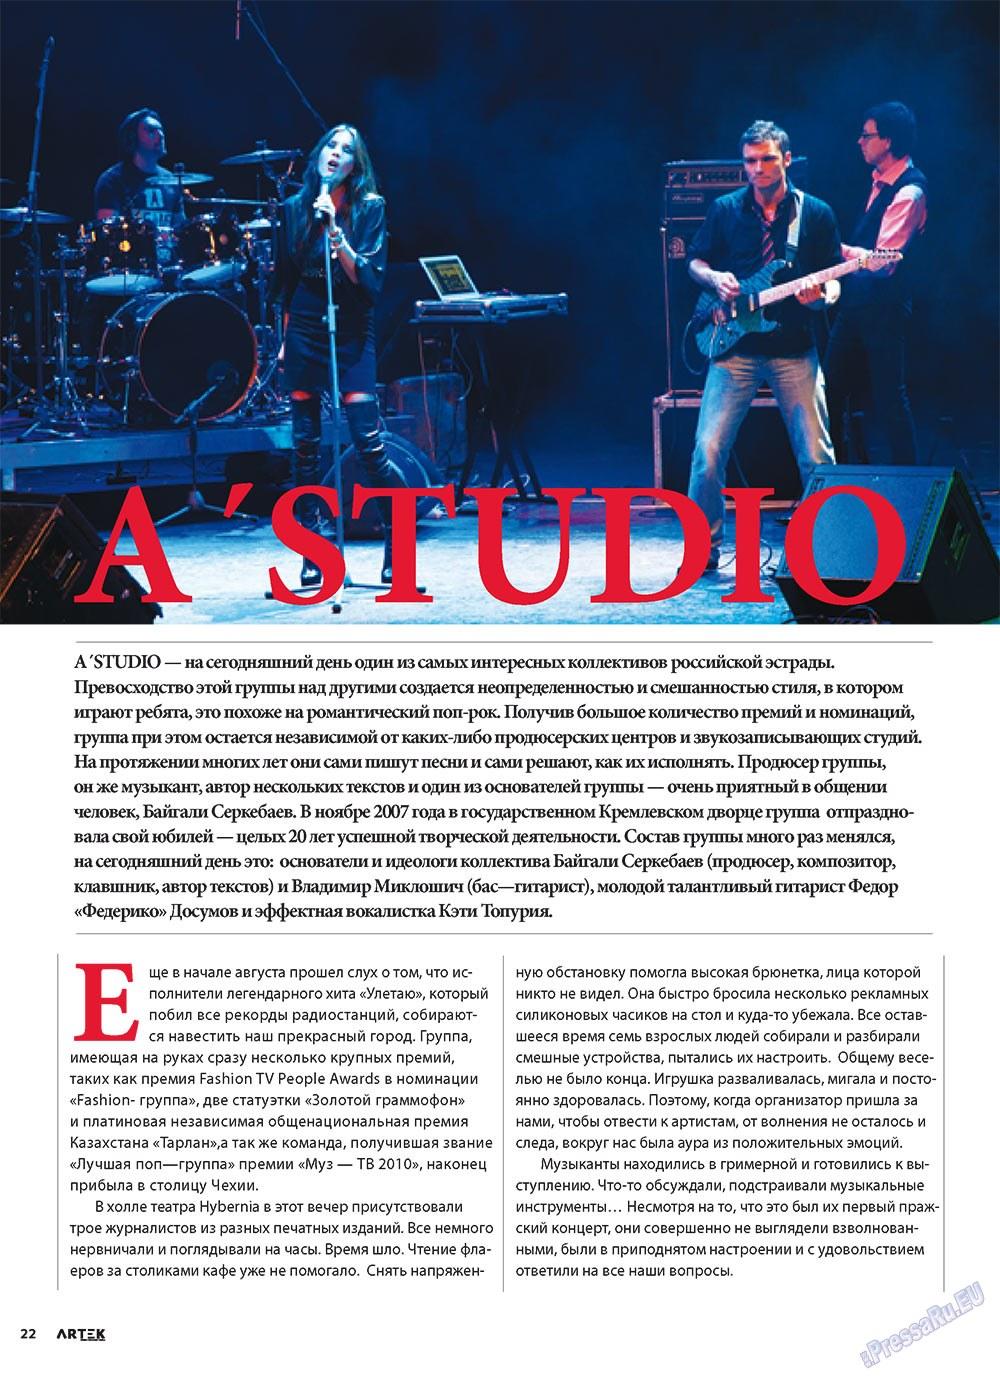 Артек (журнал). 2010 год, номер 5, стр. 24